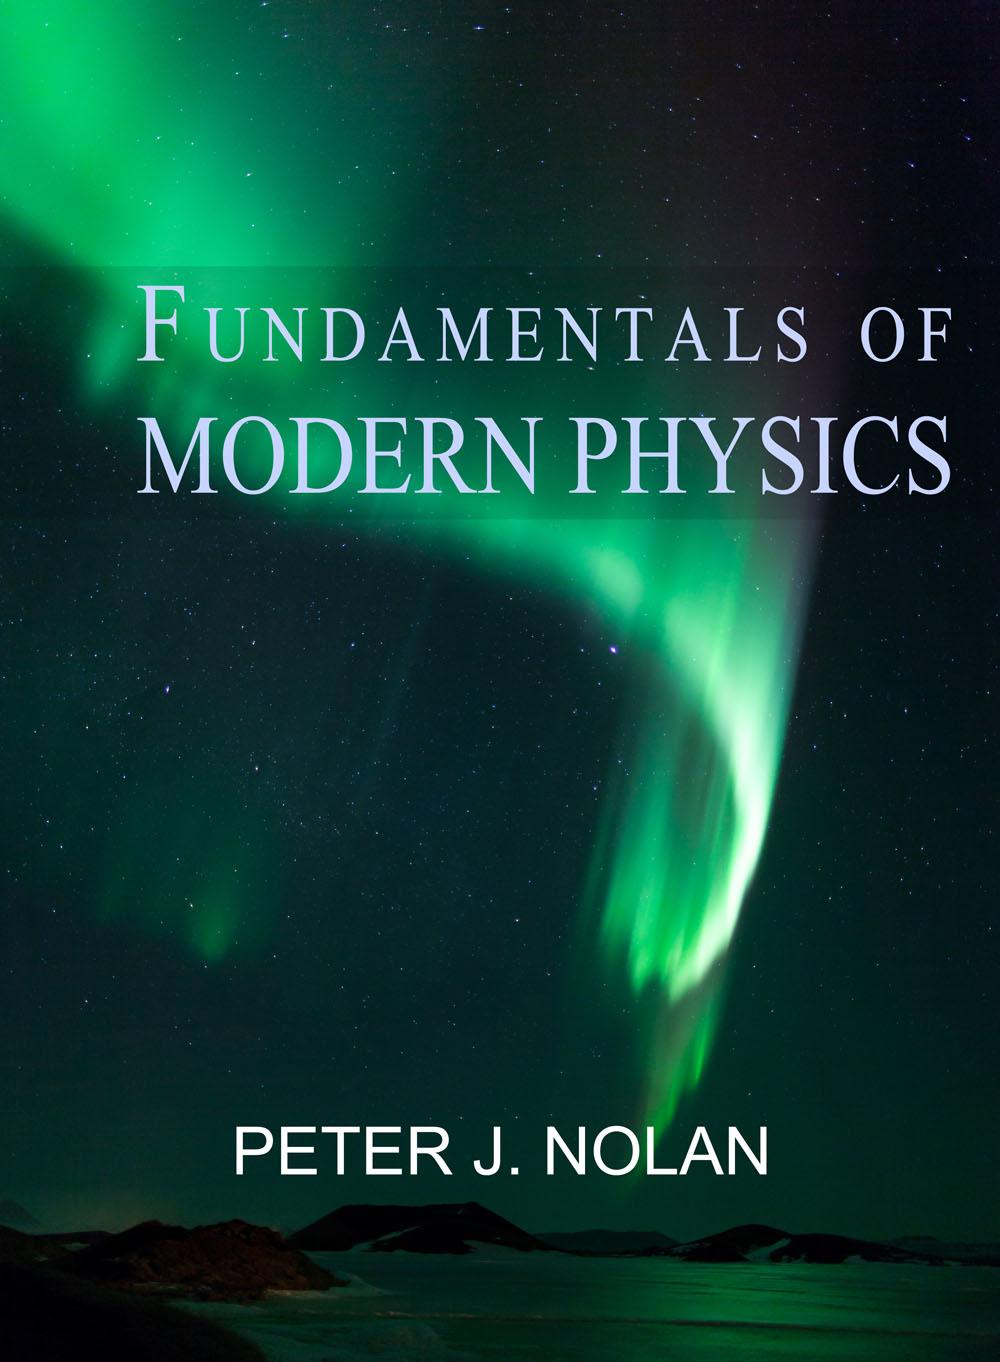 Fundamentals of Modern Physics by Peter Nolan